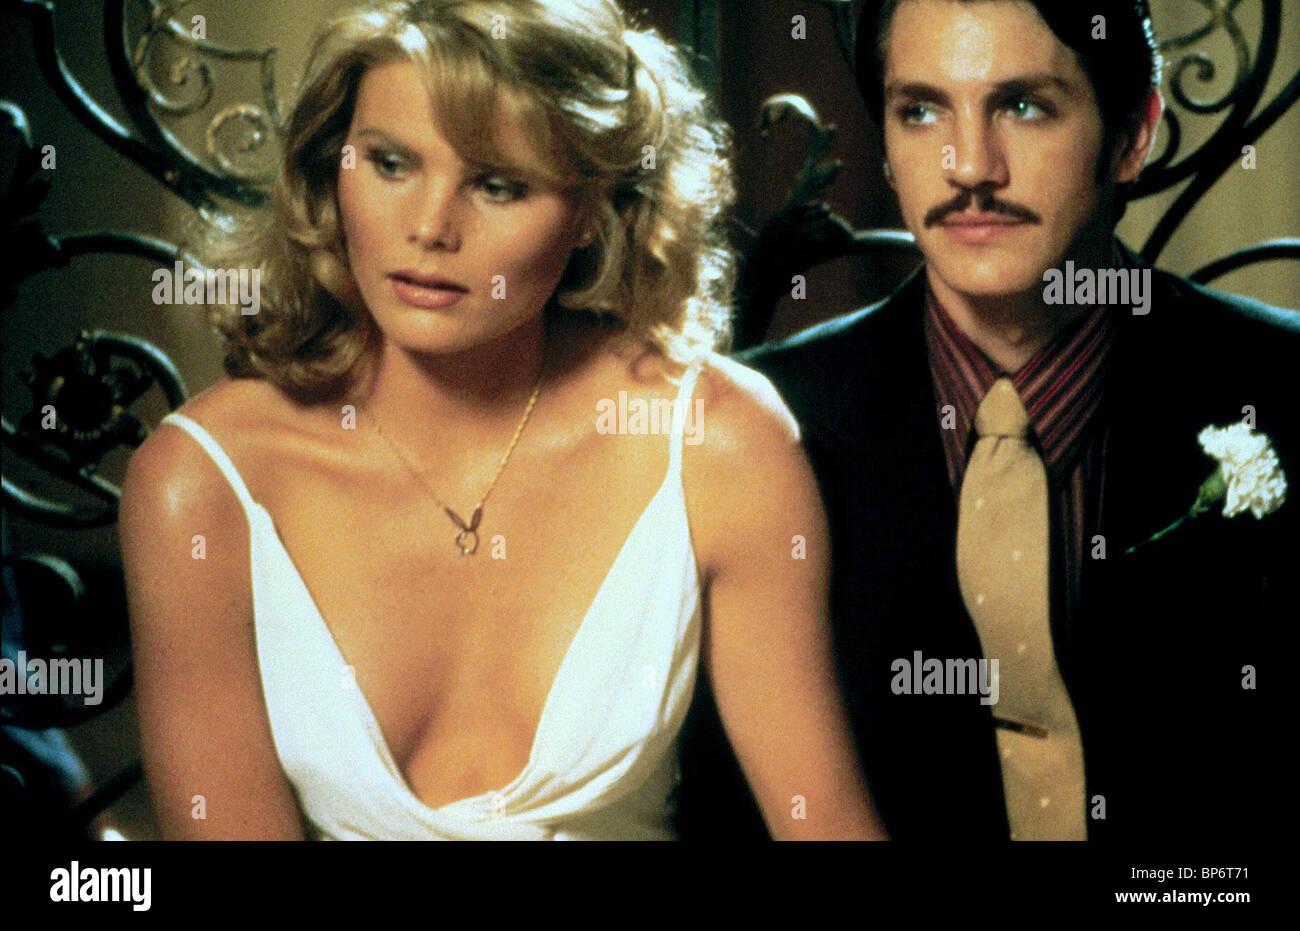 MARIEL HEMINGWAY ERIC ROBERTS STAR 80 (1983) - Stock Image